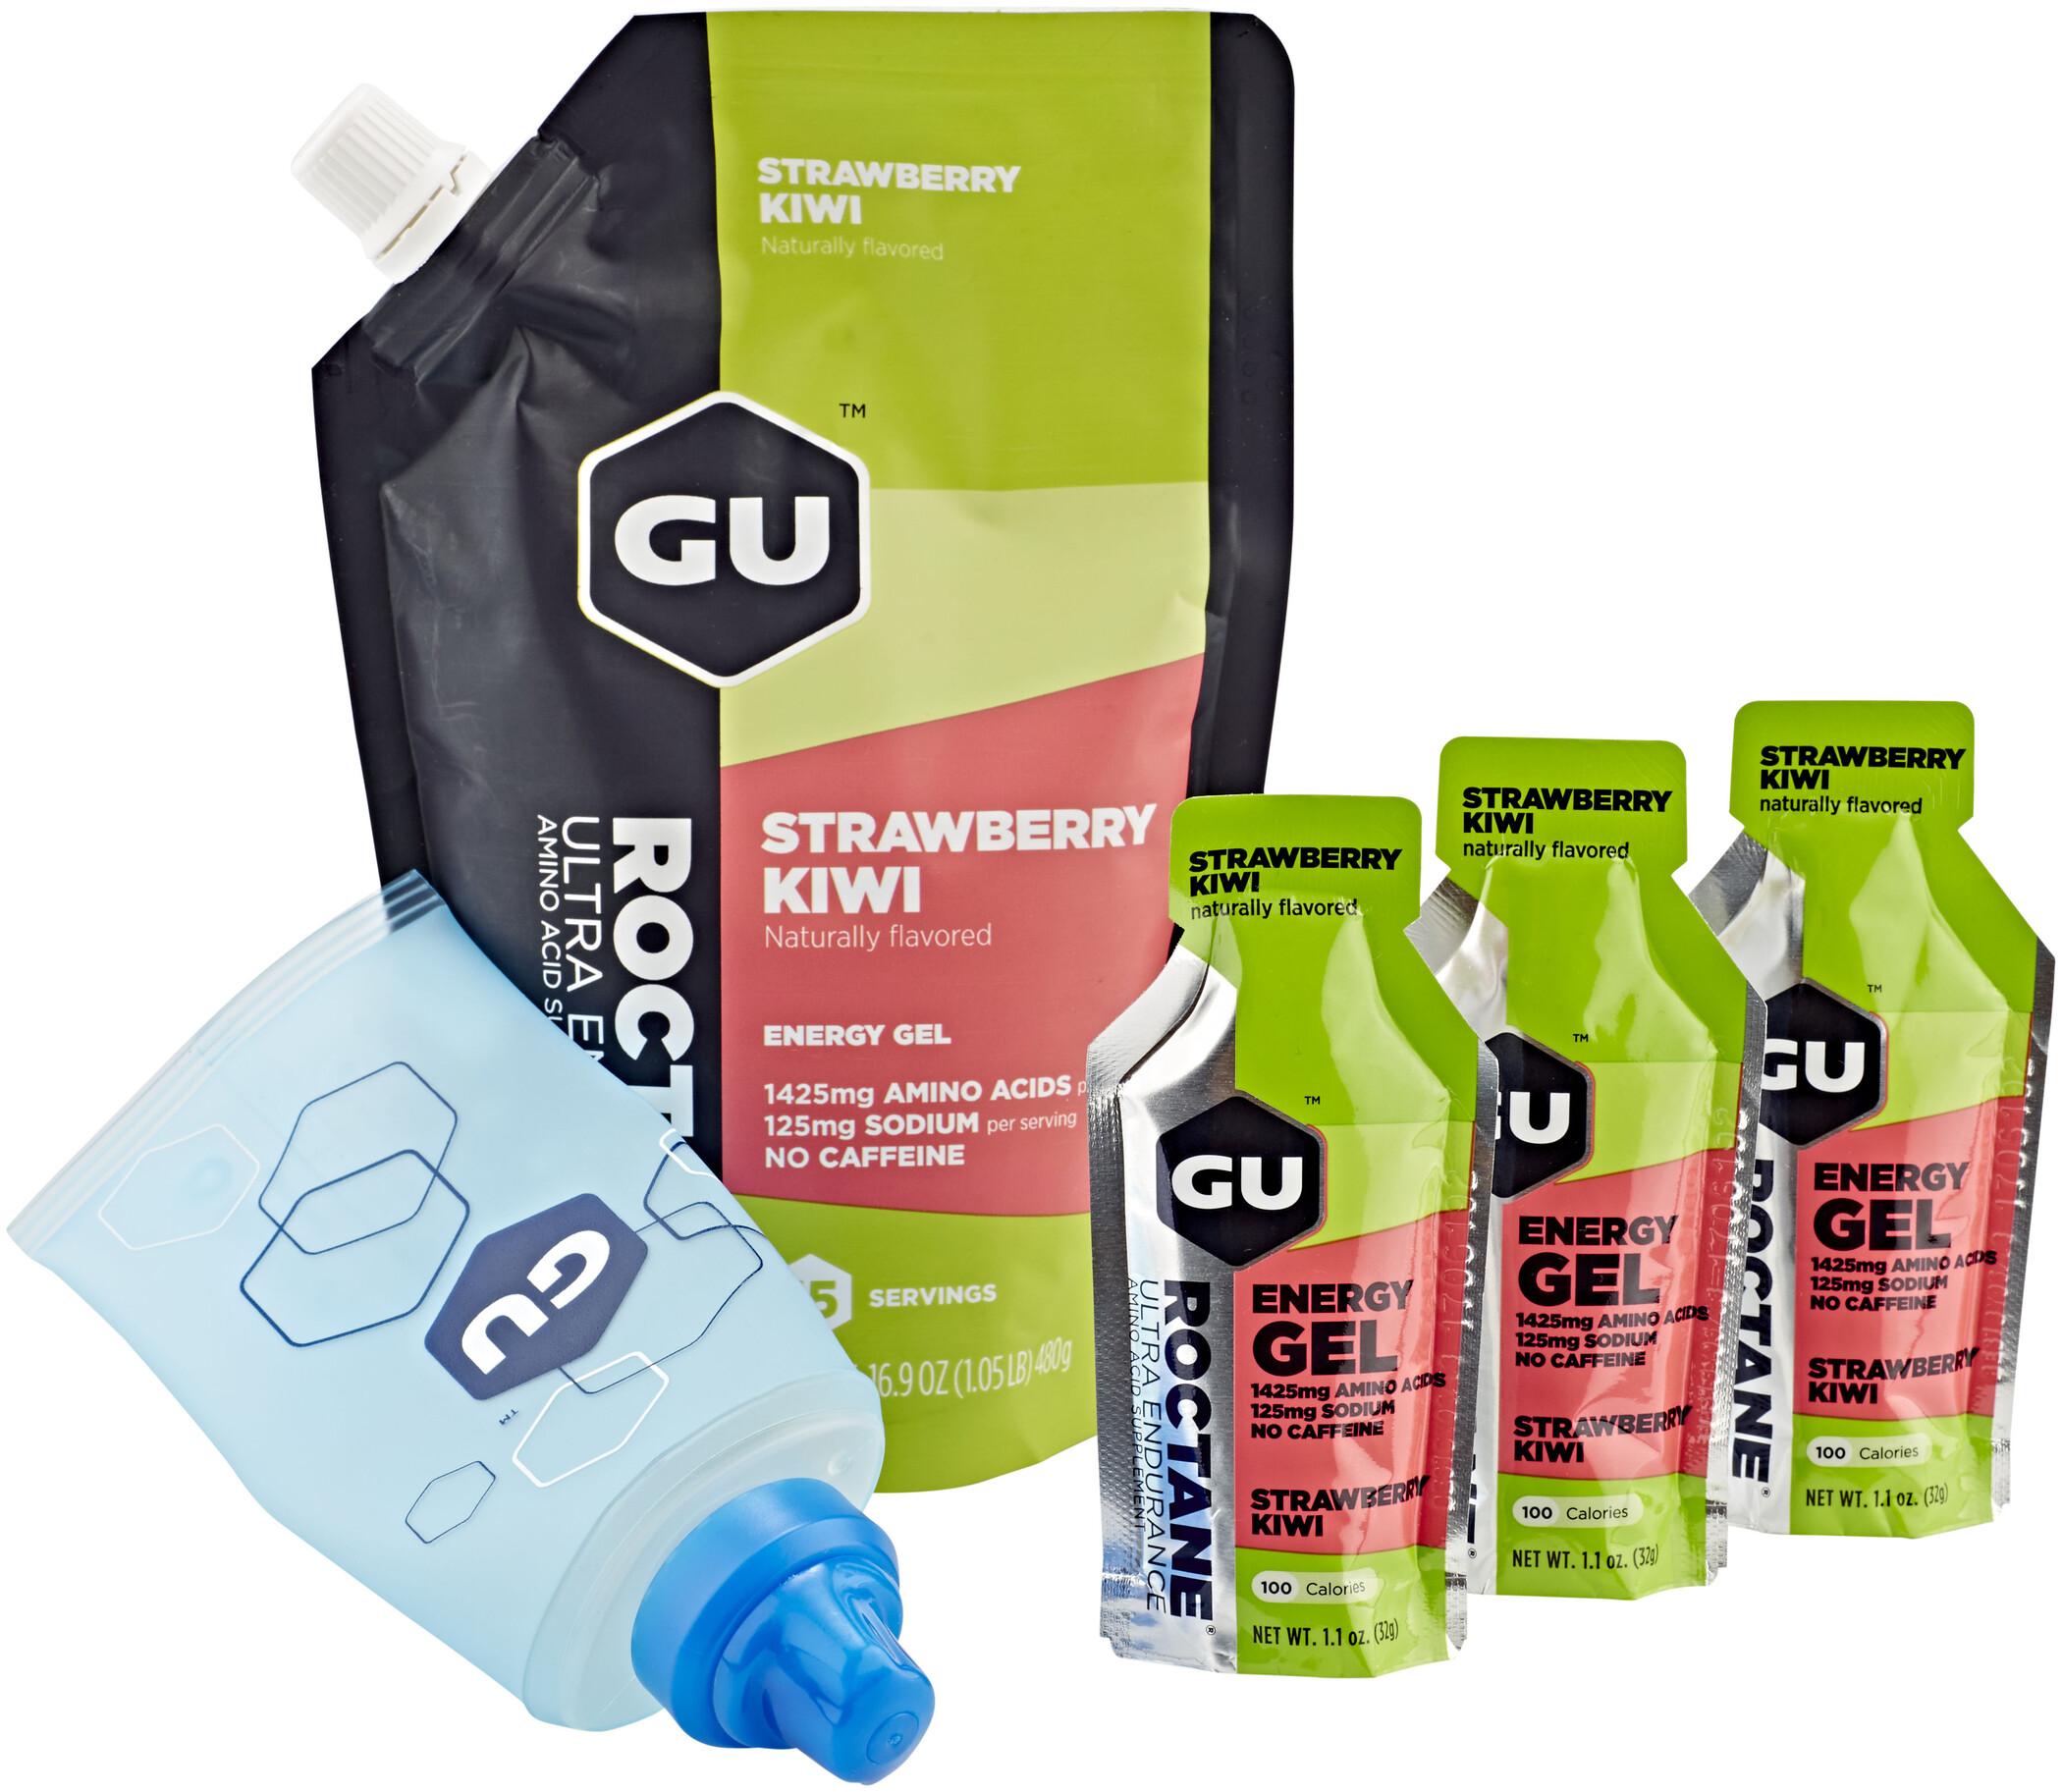 GU Energy Roctane Energy Gel Bundle Bulk Pack 480g + Gel 3x32g + Flask, Strawberry Kiwi | Energigels